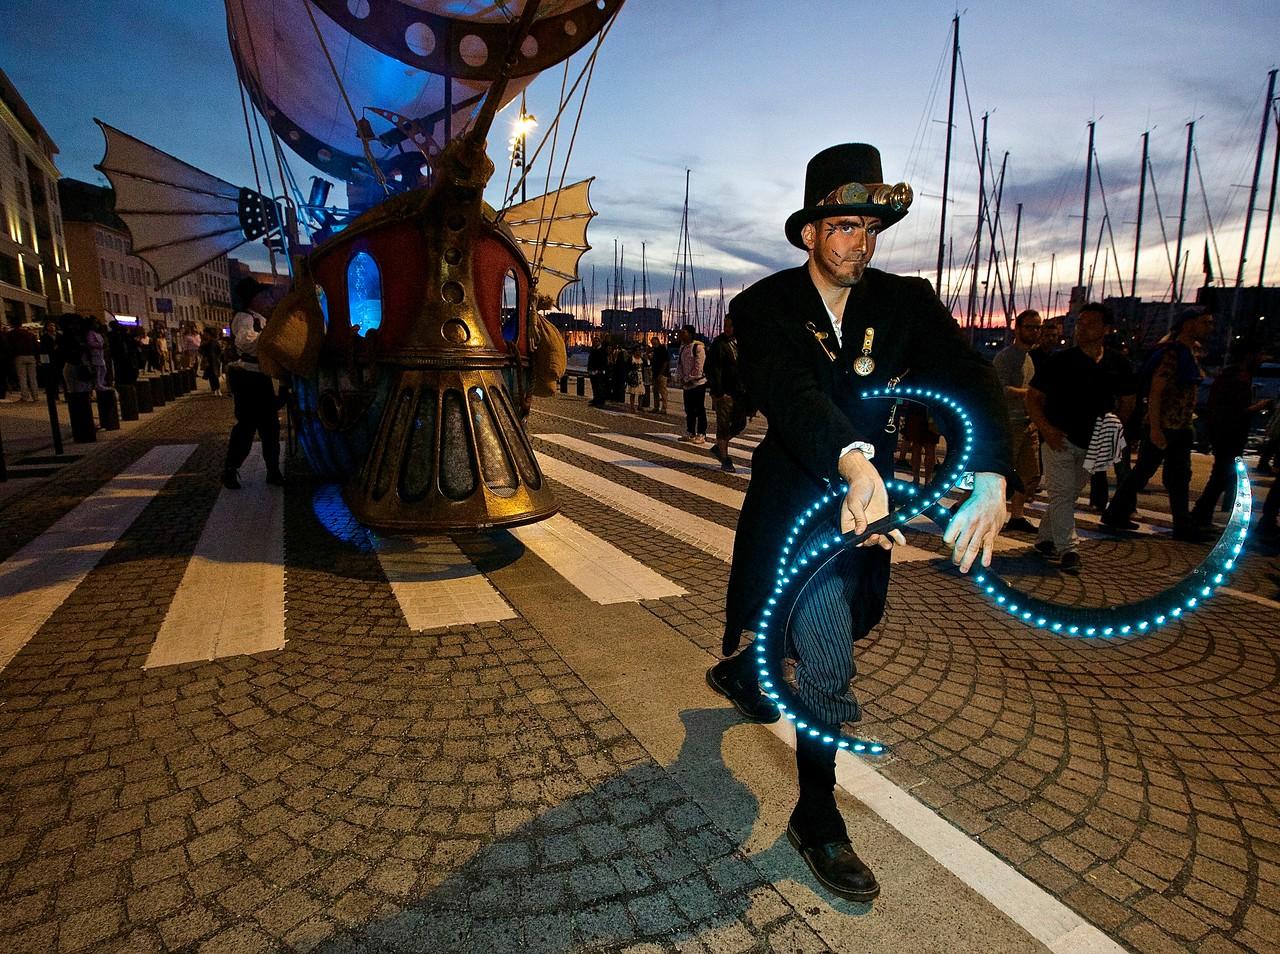 Fantasy Parade #1